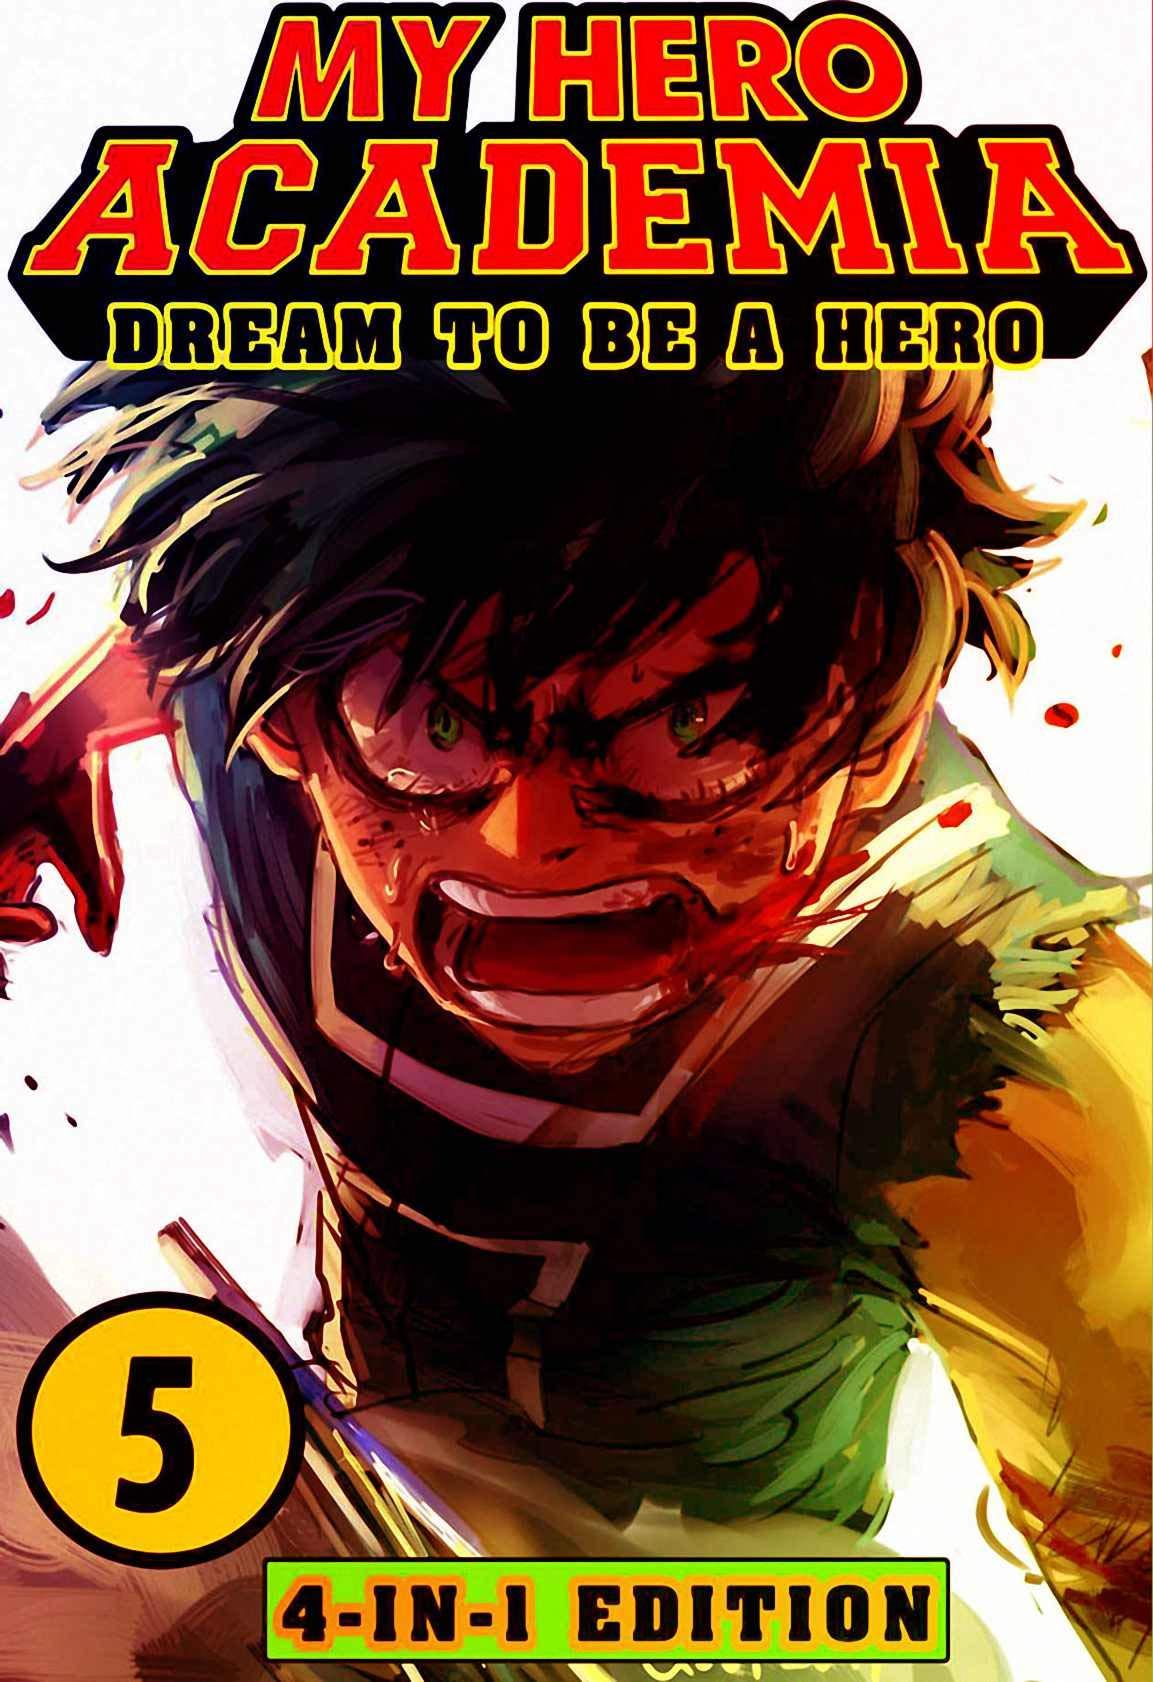 My Hero Academia Dream: Book 5 Collection - New Edition - Action Shonen Manga My Hero Academia Fantasy Adventures